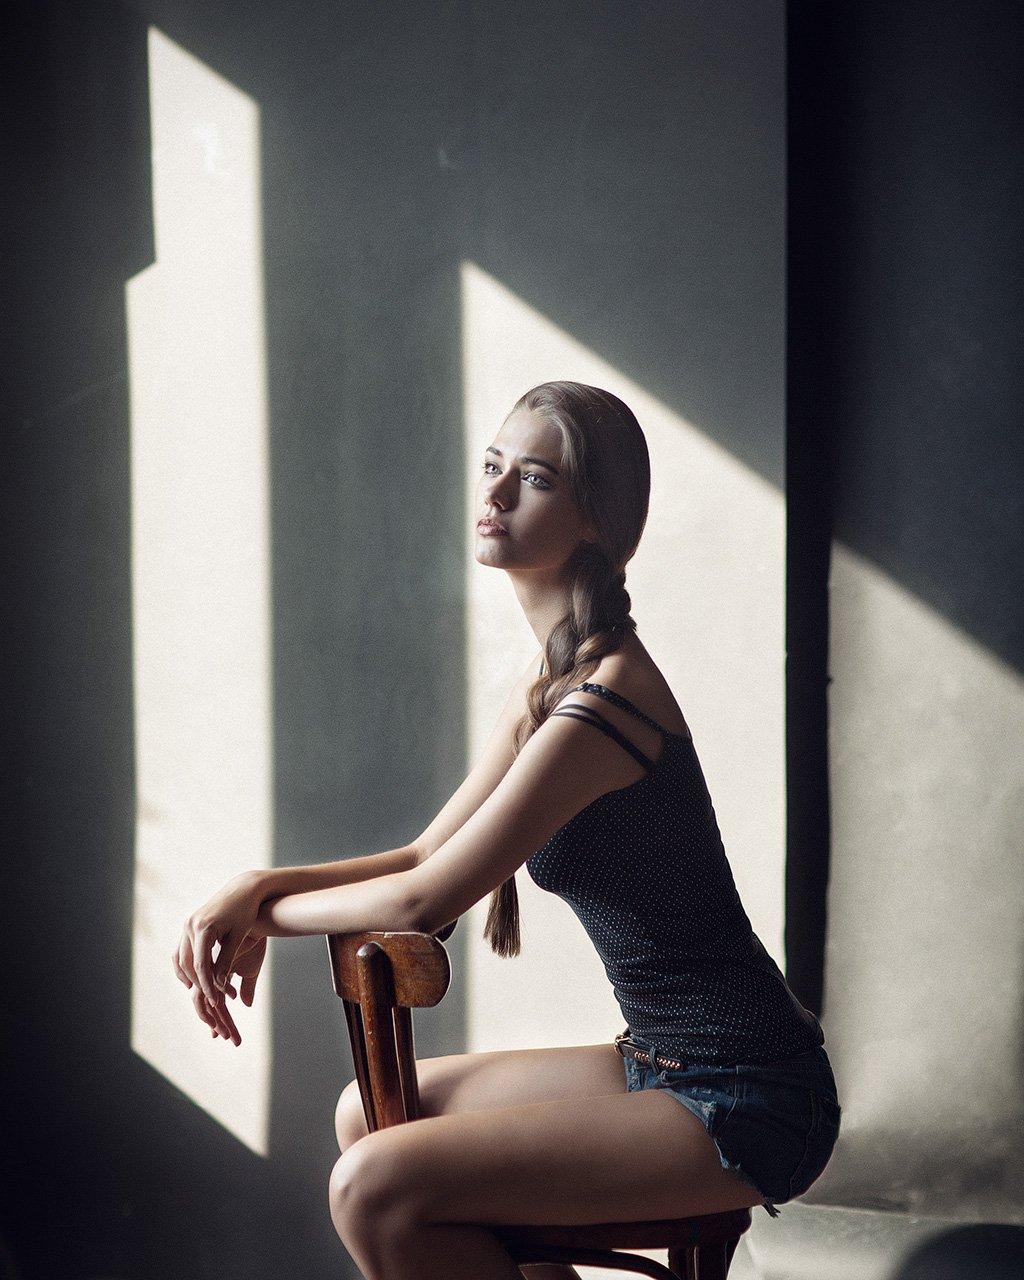 Girl, Light, People, Portrait, Казанцев Алексей